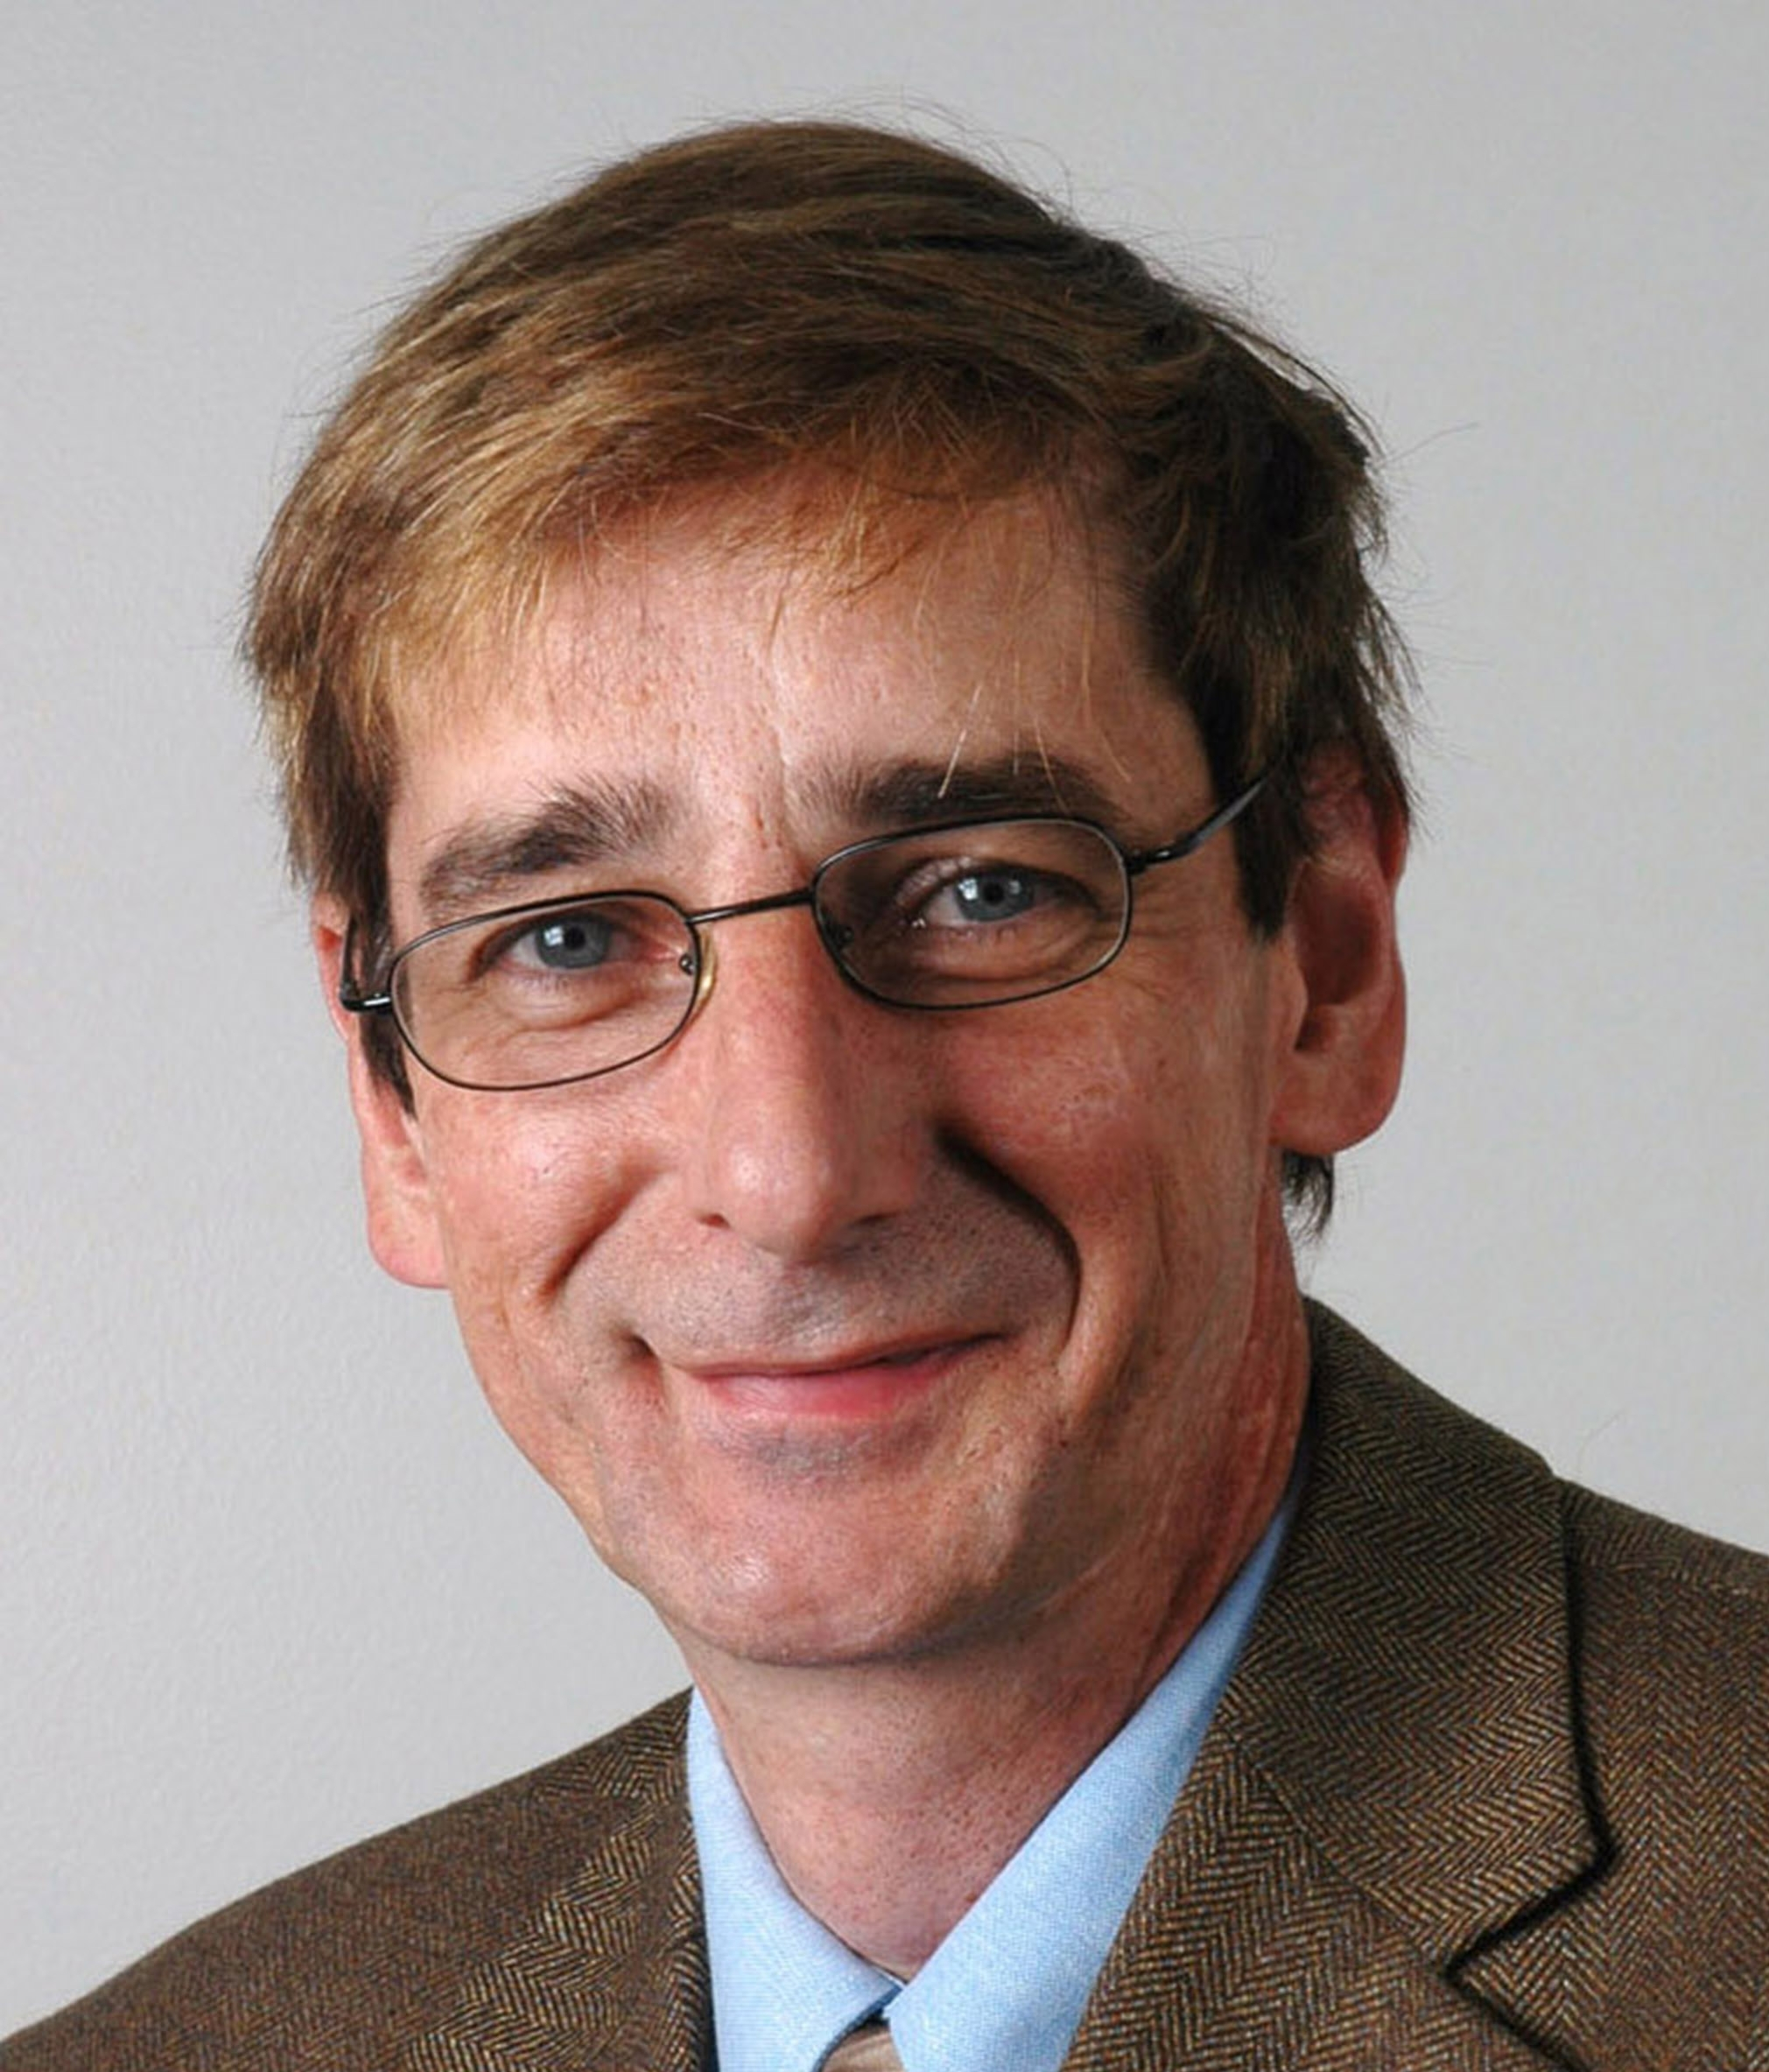 Frank Kanonik , Printing Industry Expert